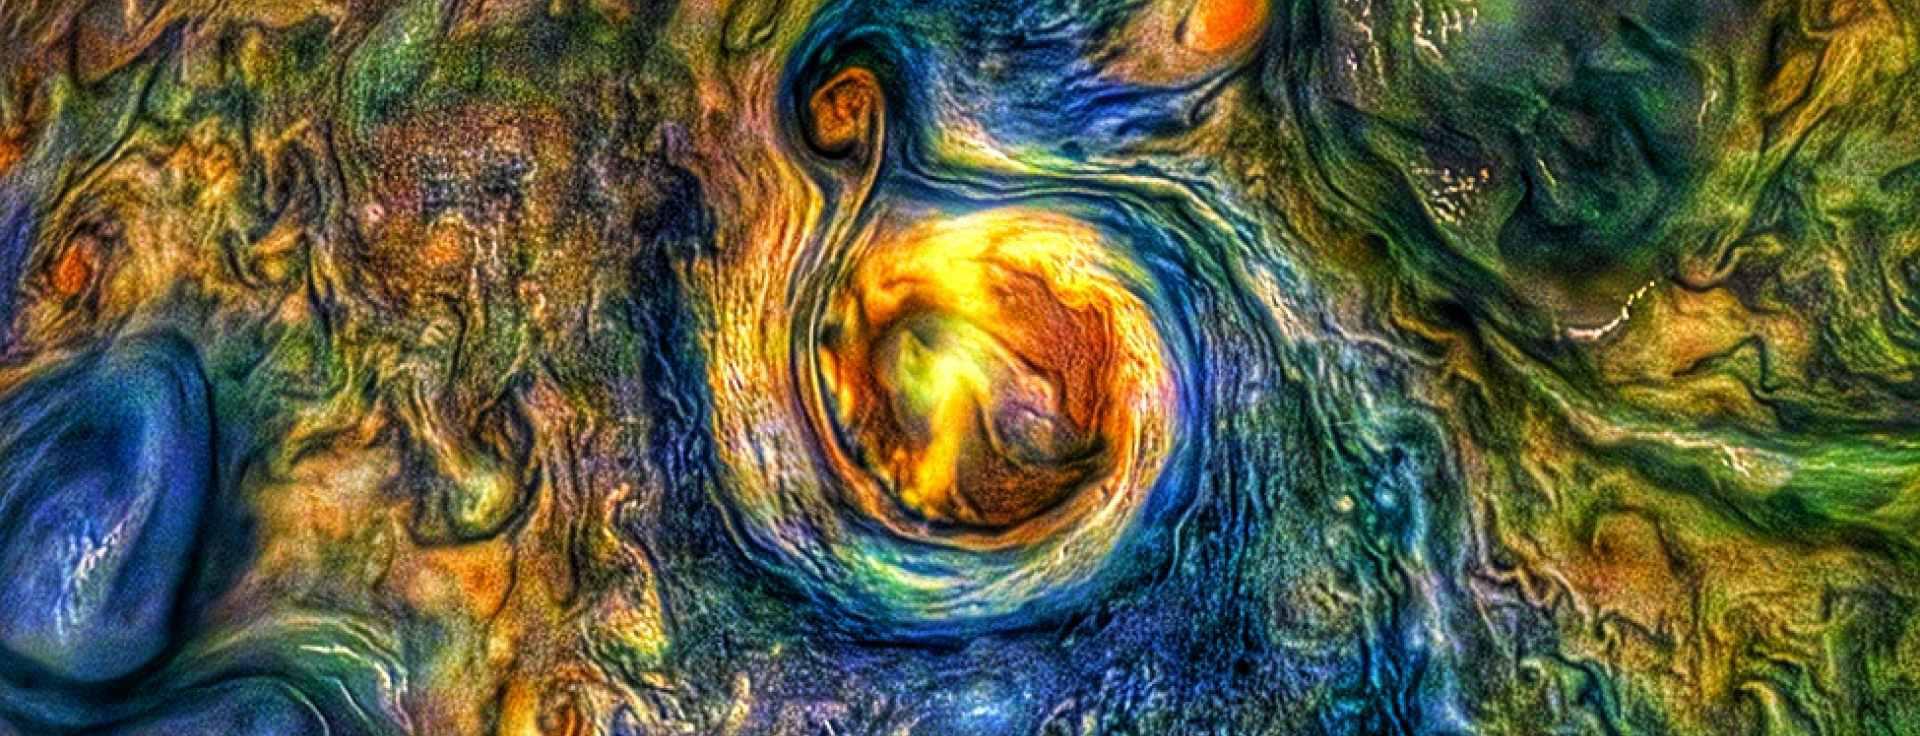 a rainbow of marbled swirls on jupiter's atmosphere